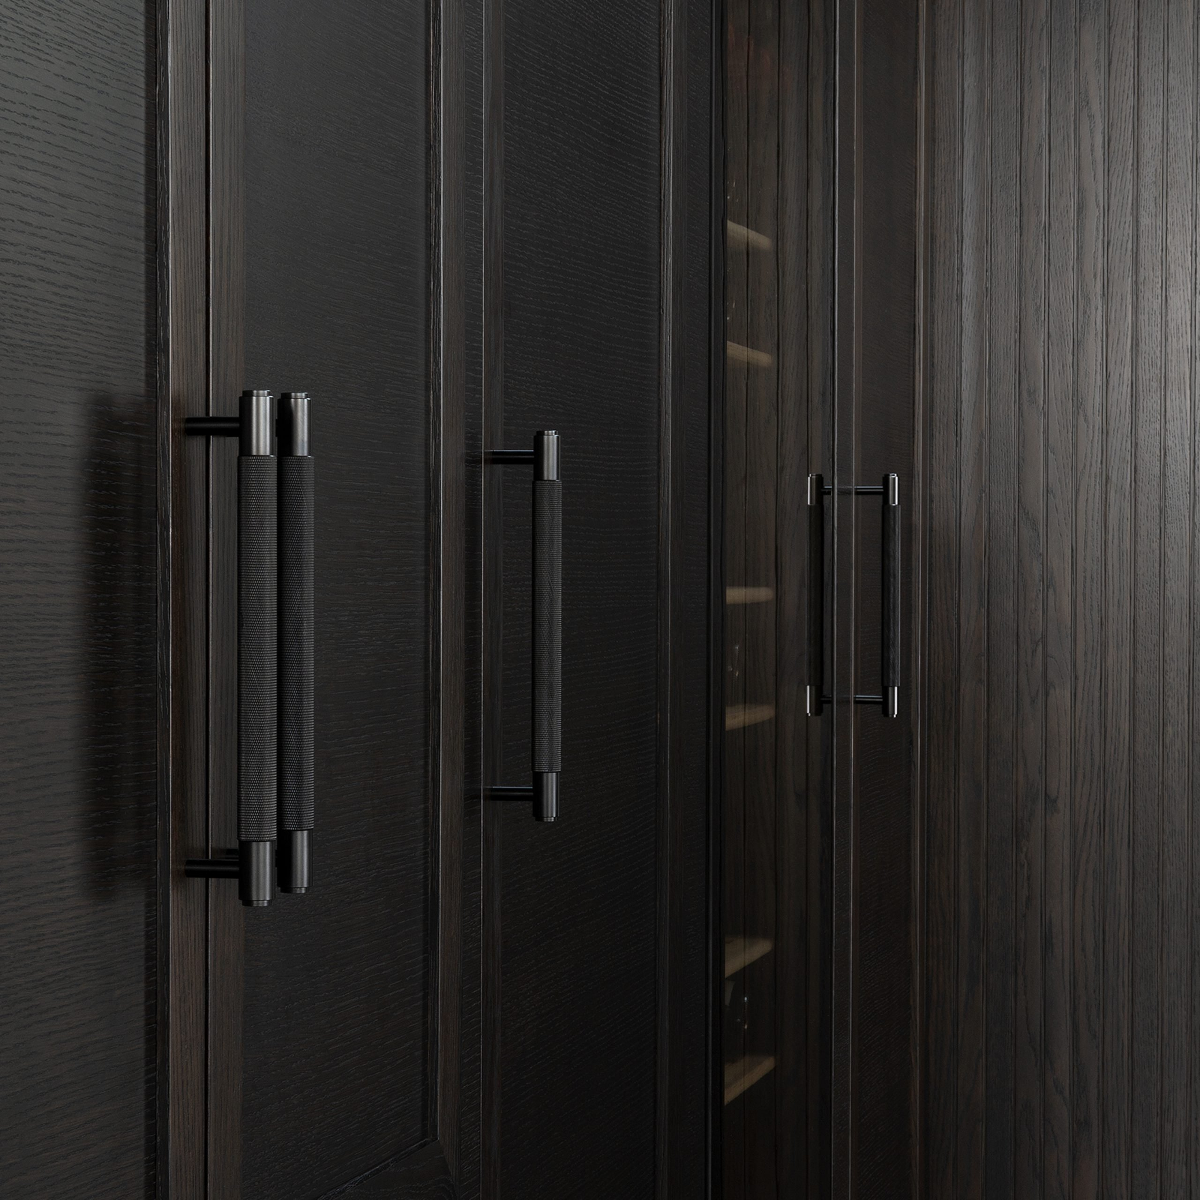 2. Buster+Punch_Pull Bar_Smoked Bronze_Closet 2